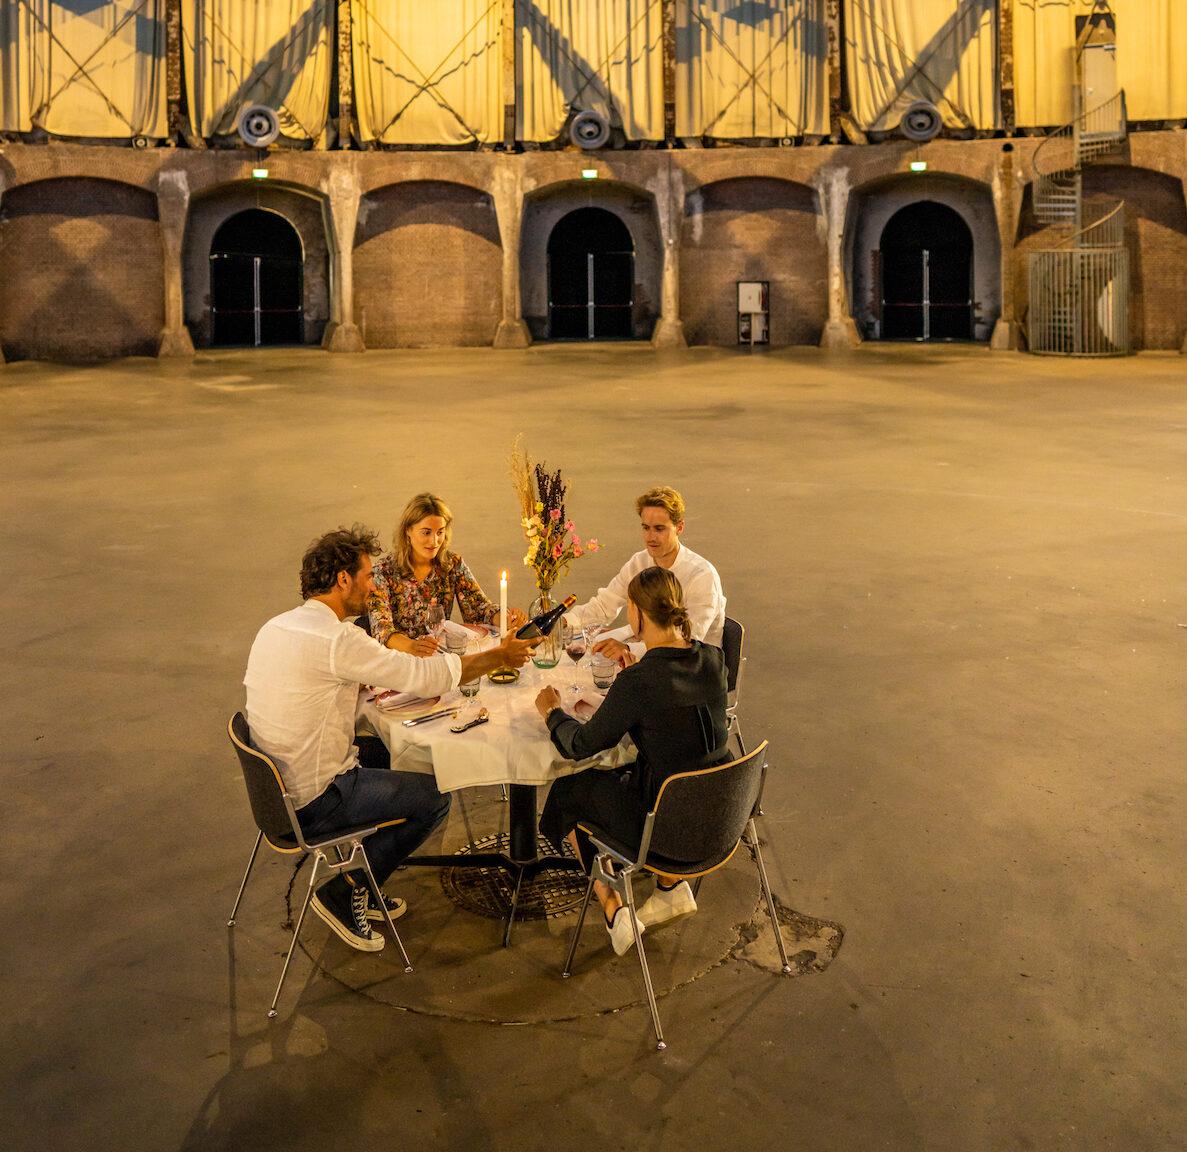 rond de tafel - bijzonder dineren amsterdam - gashouder - sterrenchefs